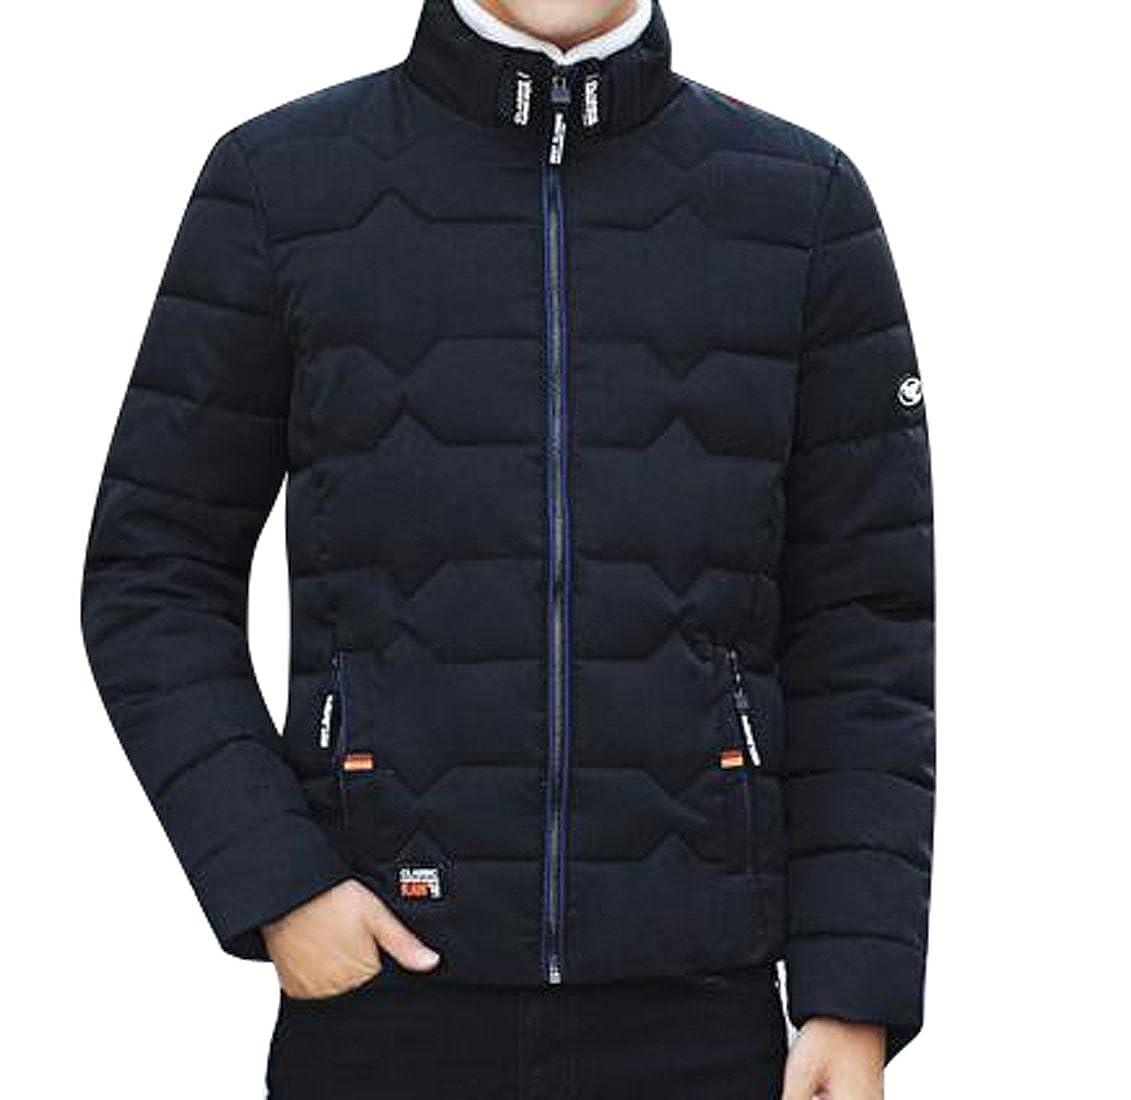 YYG-Men Winter Thicken Parka Stand Collar Quilted Down Coat Jacket Outerwear